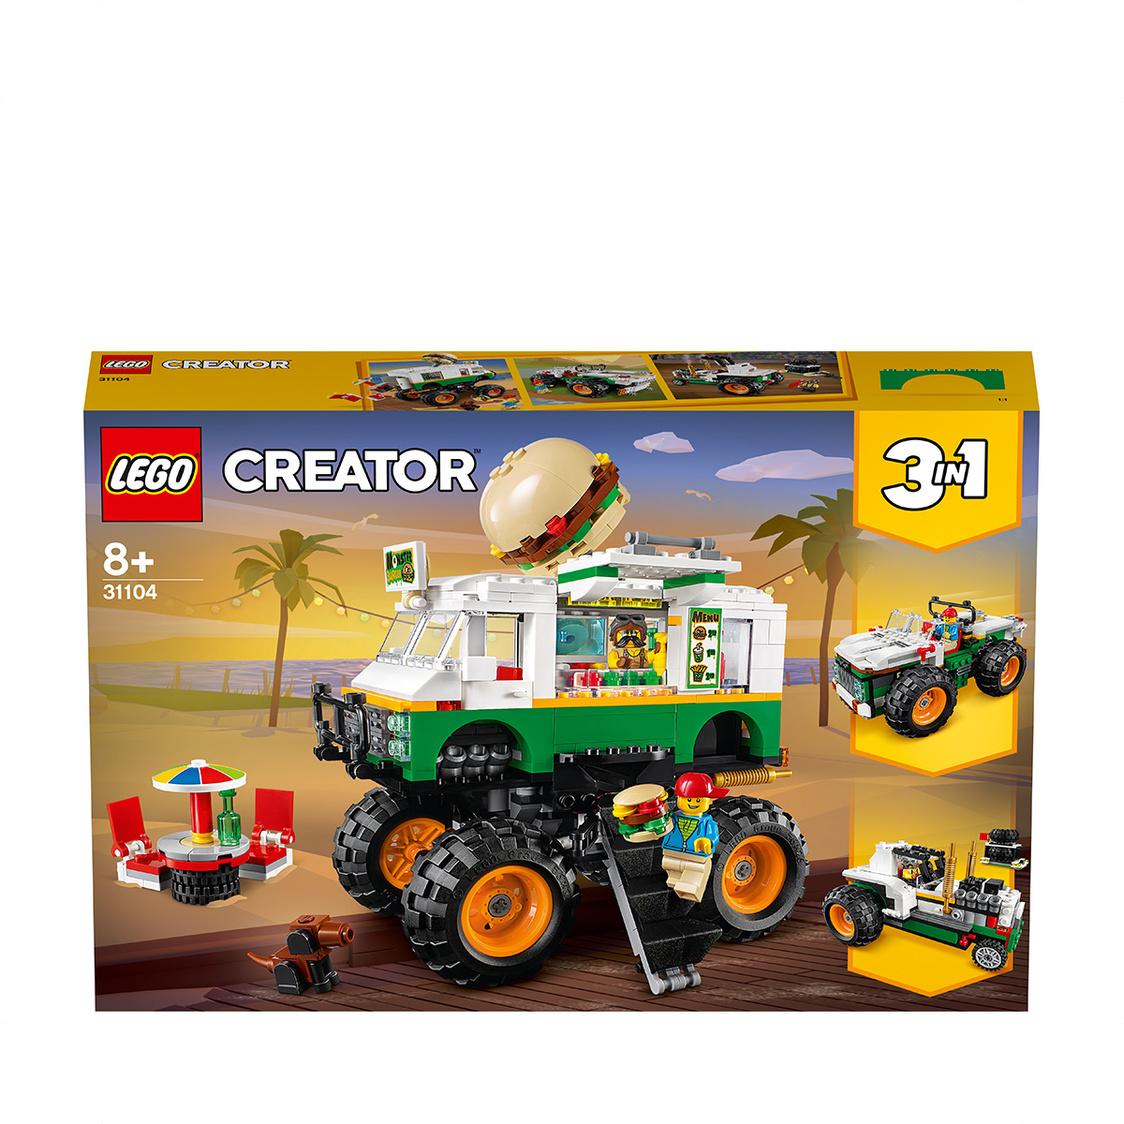 LEGO CREATOR - Monster Burger Truck 31104